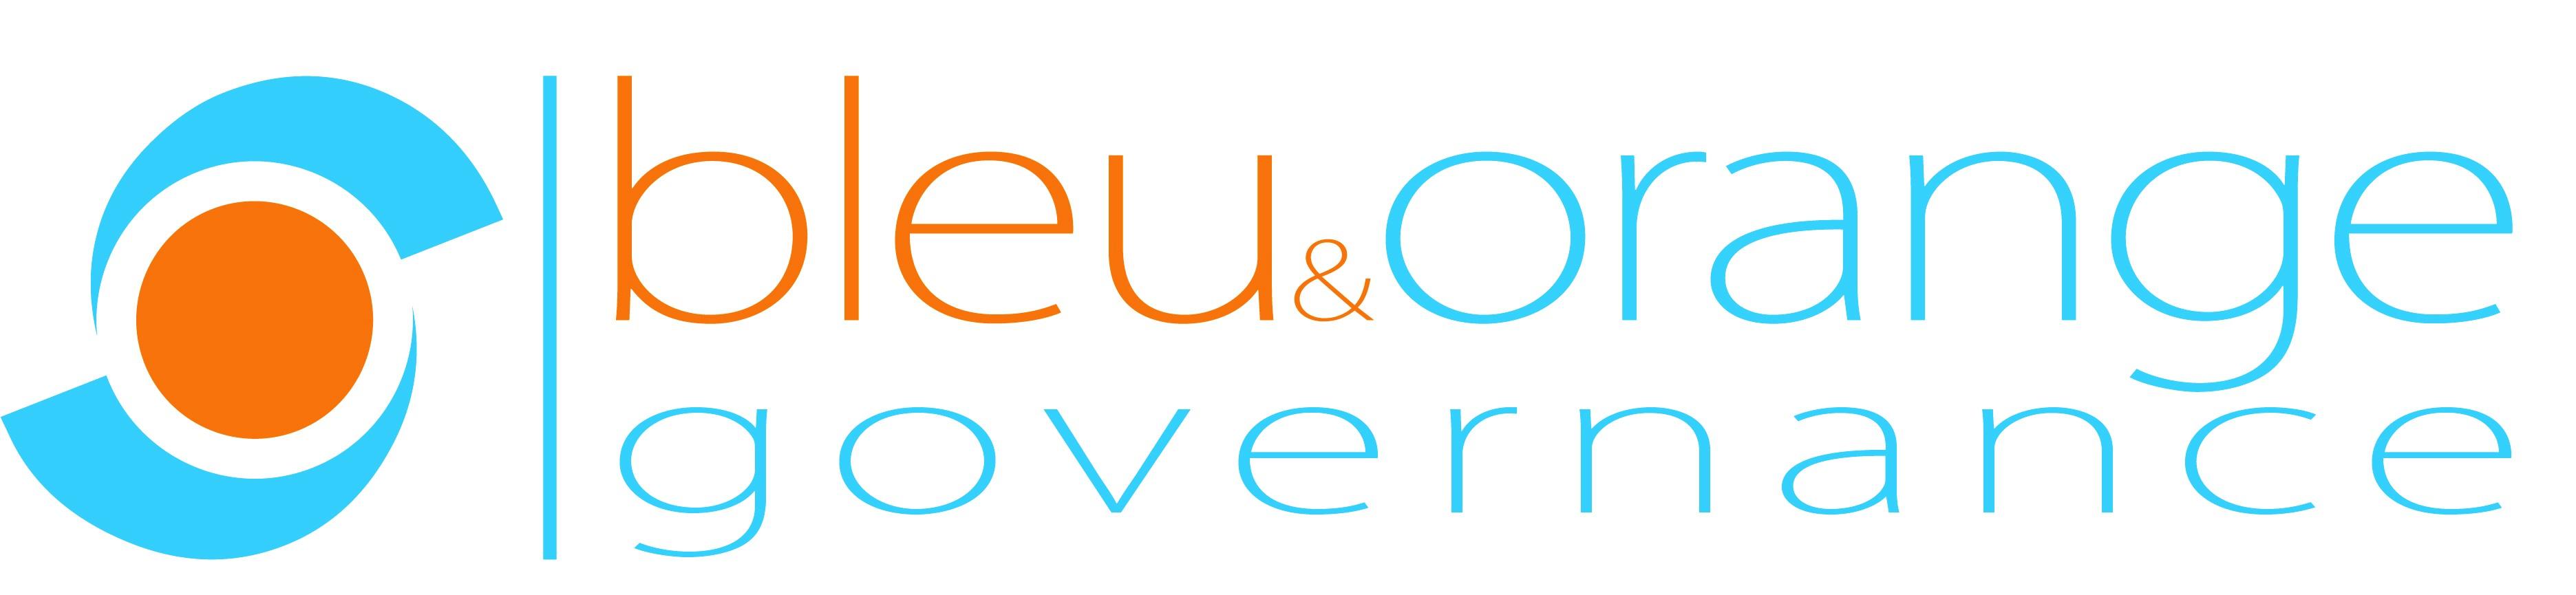 bleu&orange governance